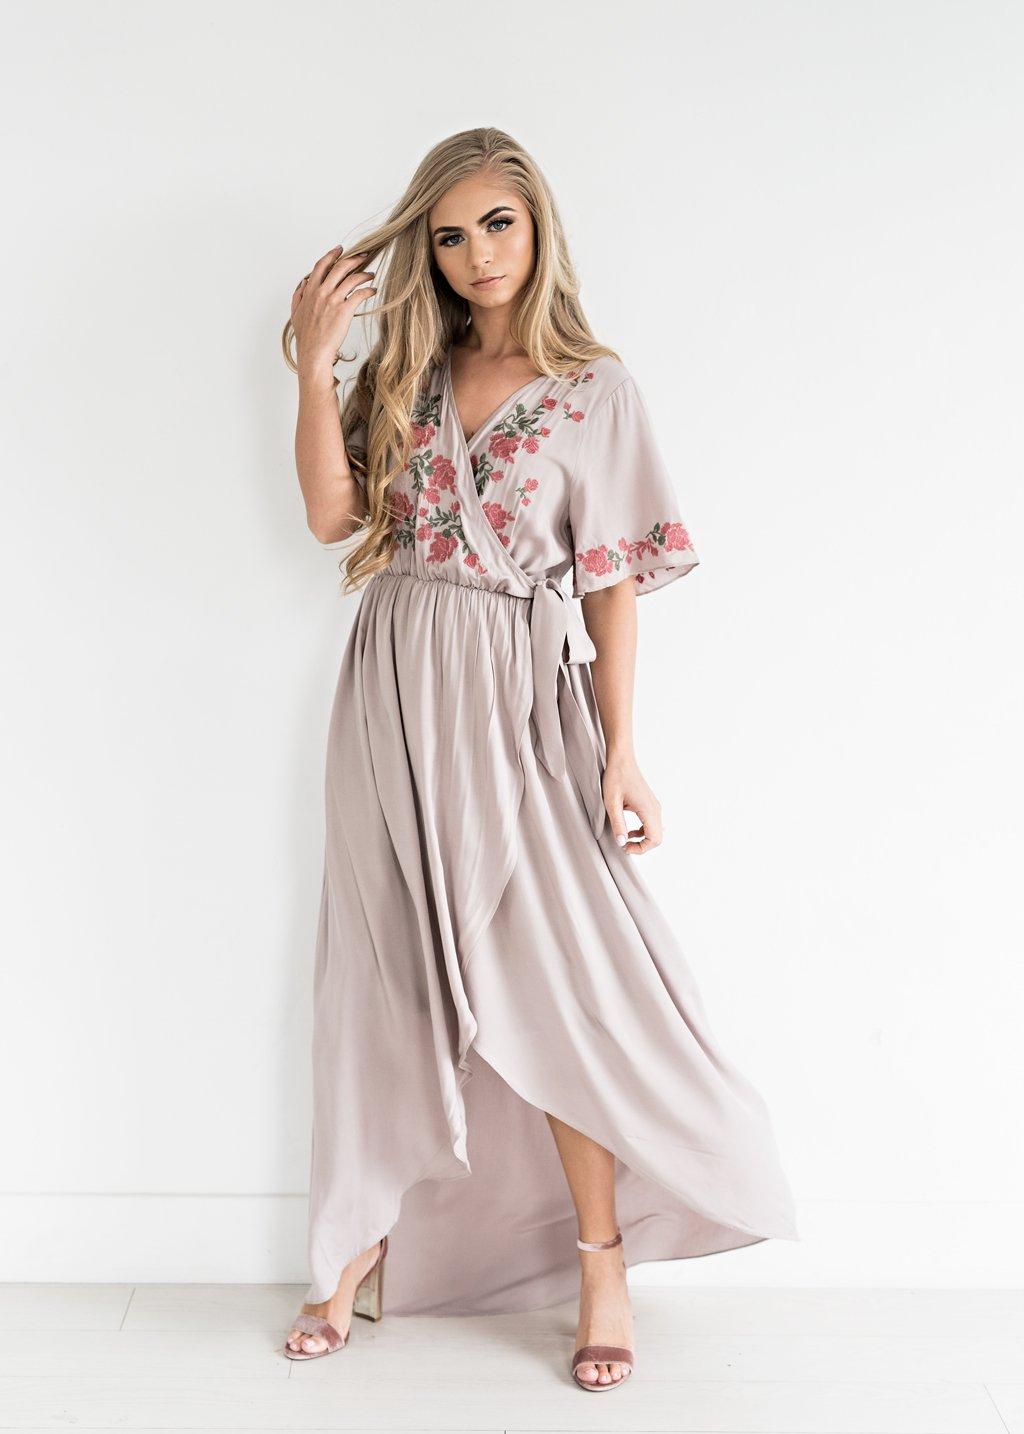 e2dcd225d49 Rosebuds and Romance Maxi Dress-JessaKae